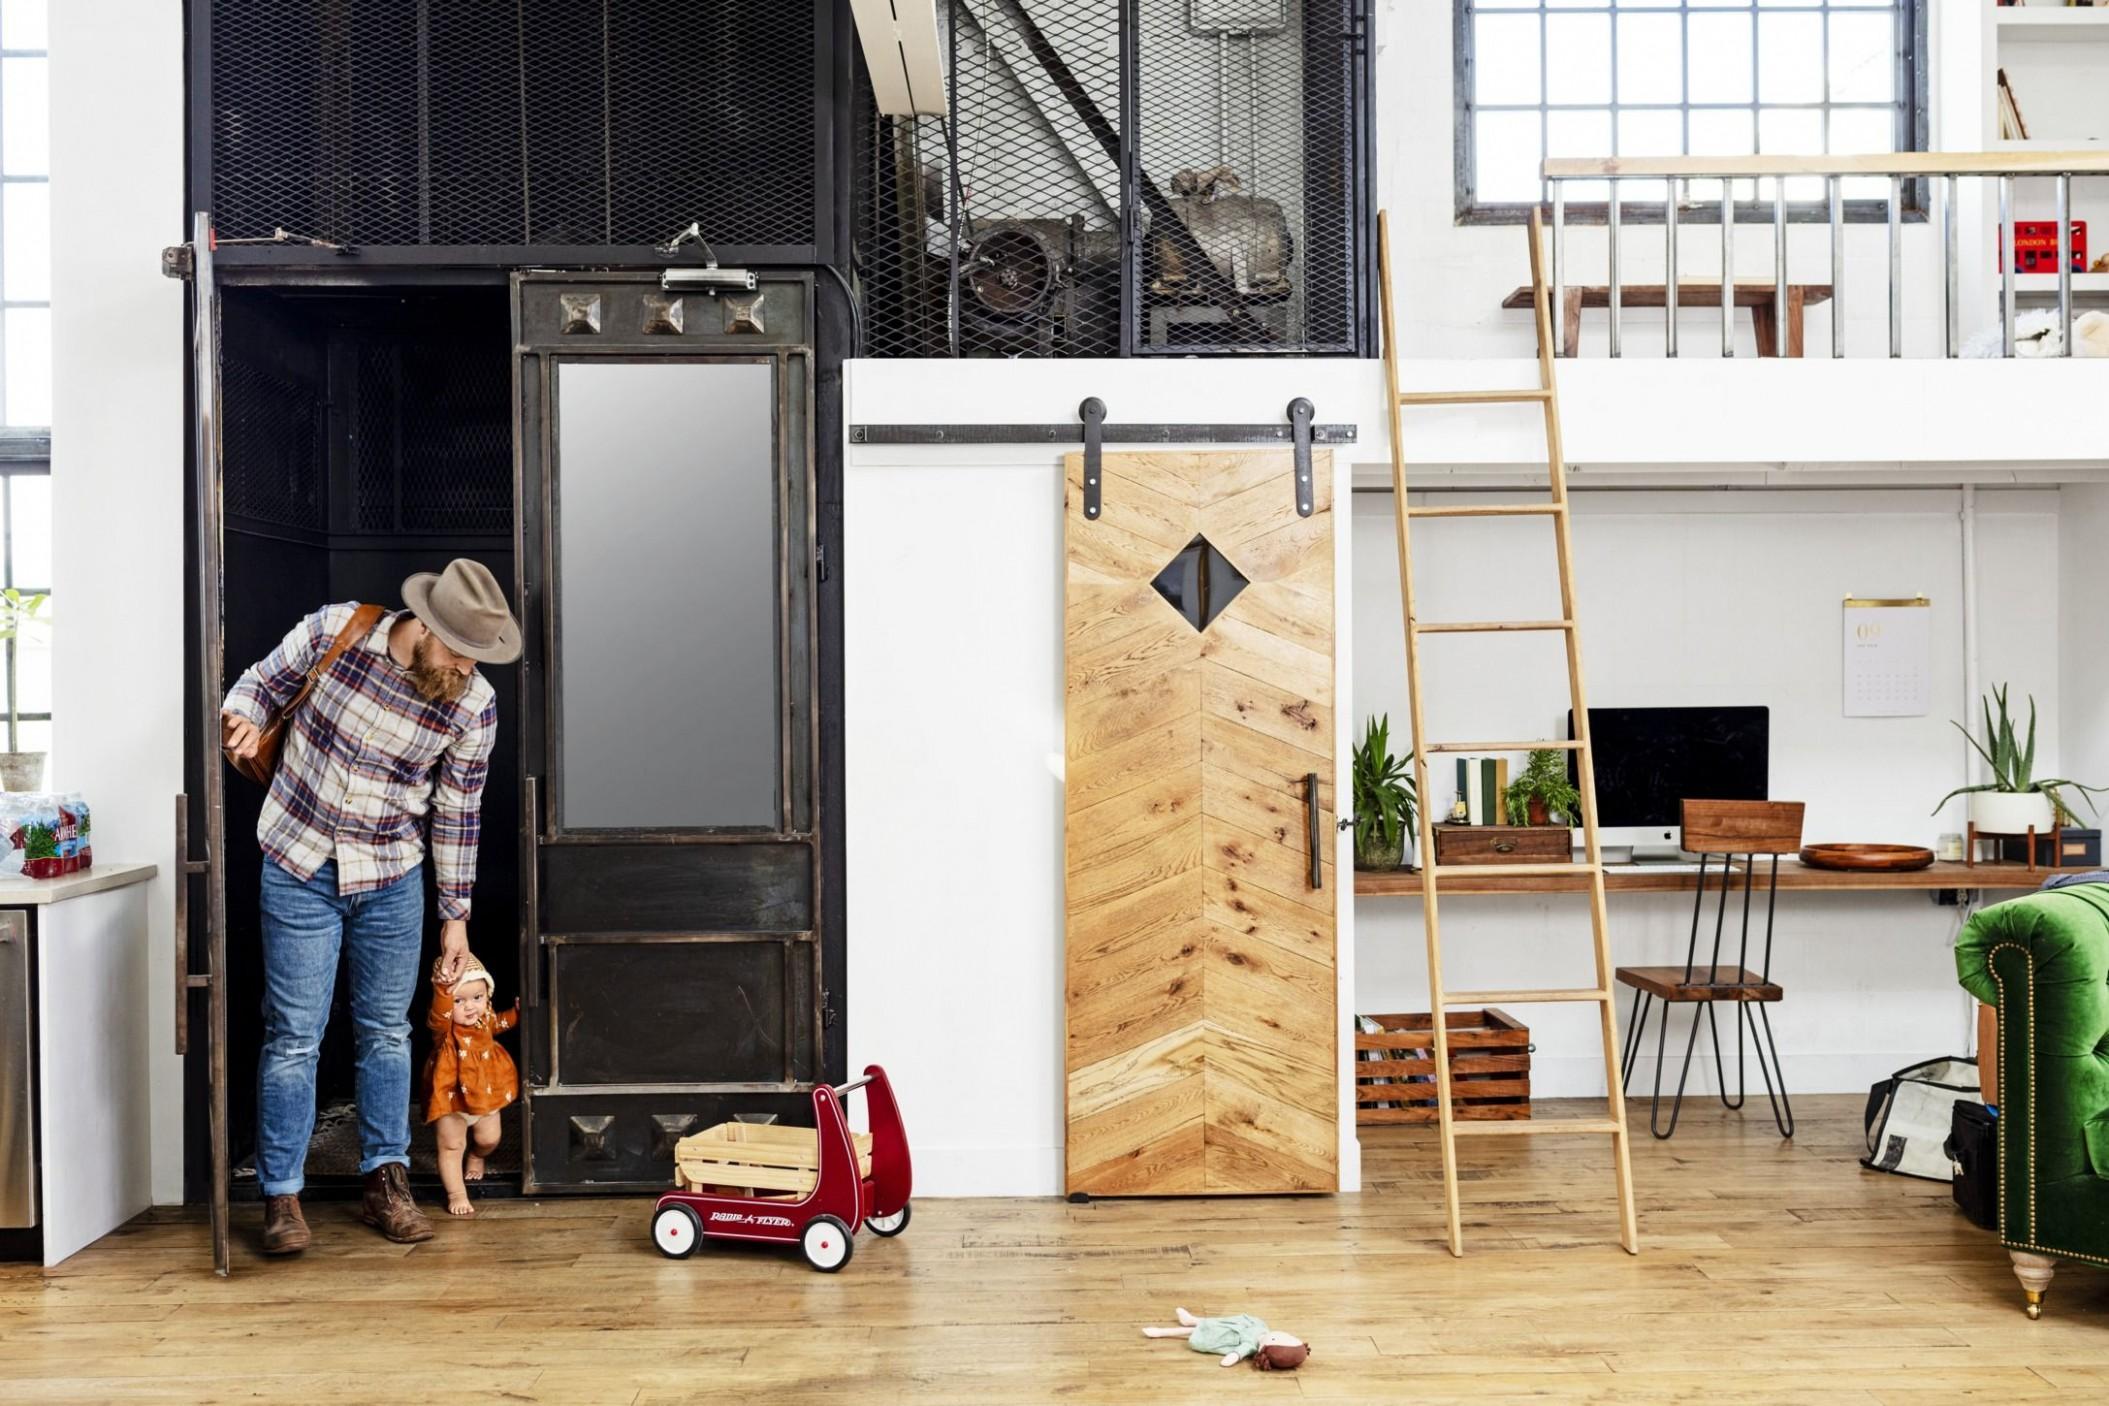 12 Best Home Office Ideas - Home Office Decor Photos - Victorian Home Office Ideas